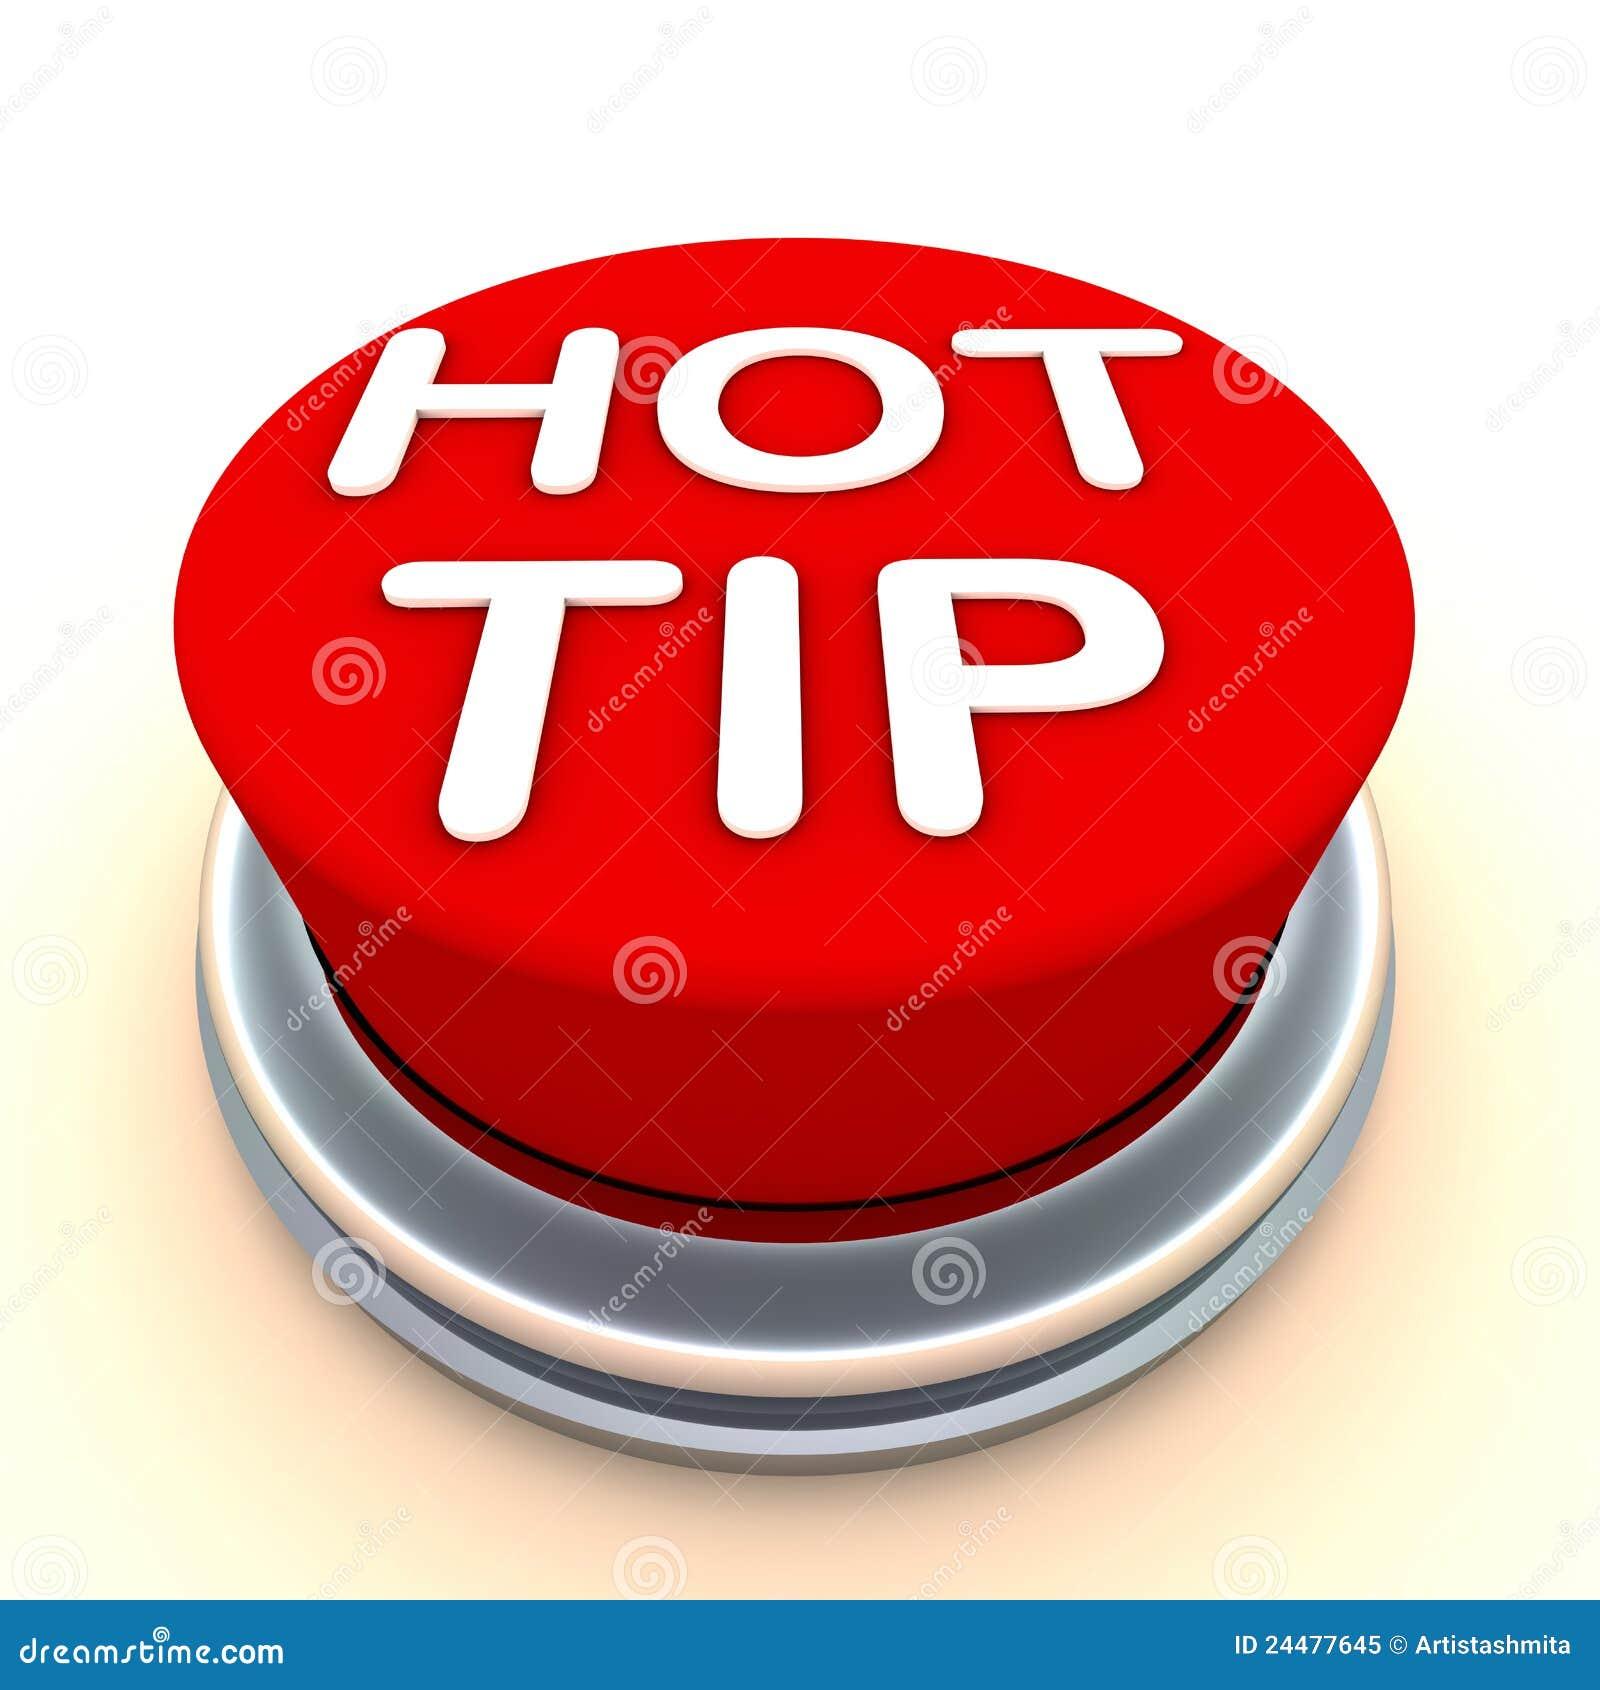 Hot Tip Royalty Free Stock Photo Image 24477645